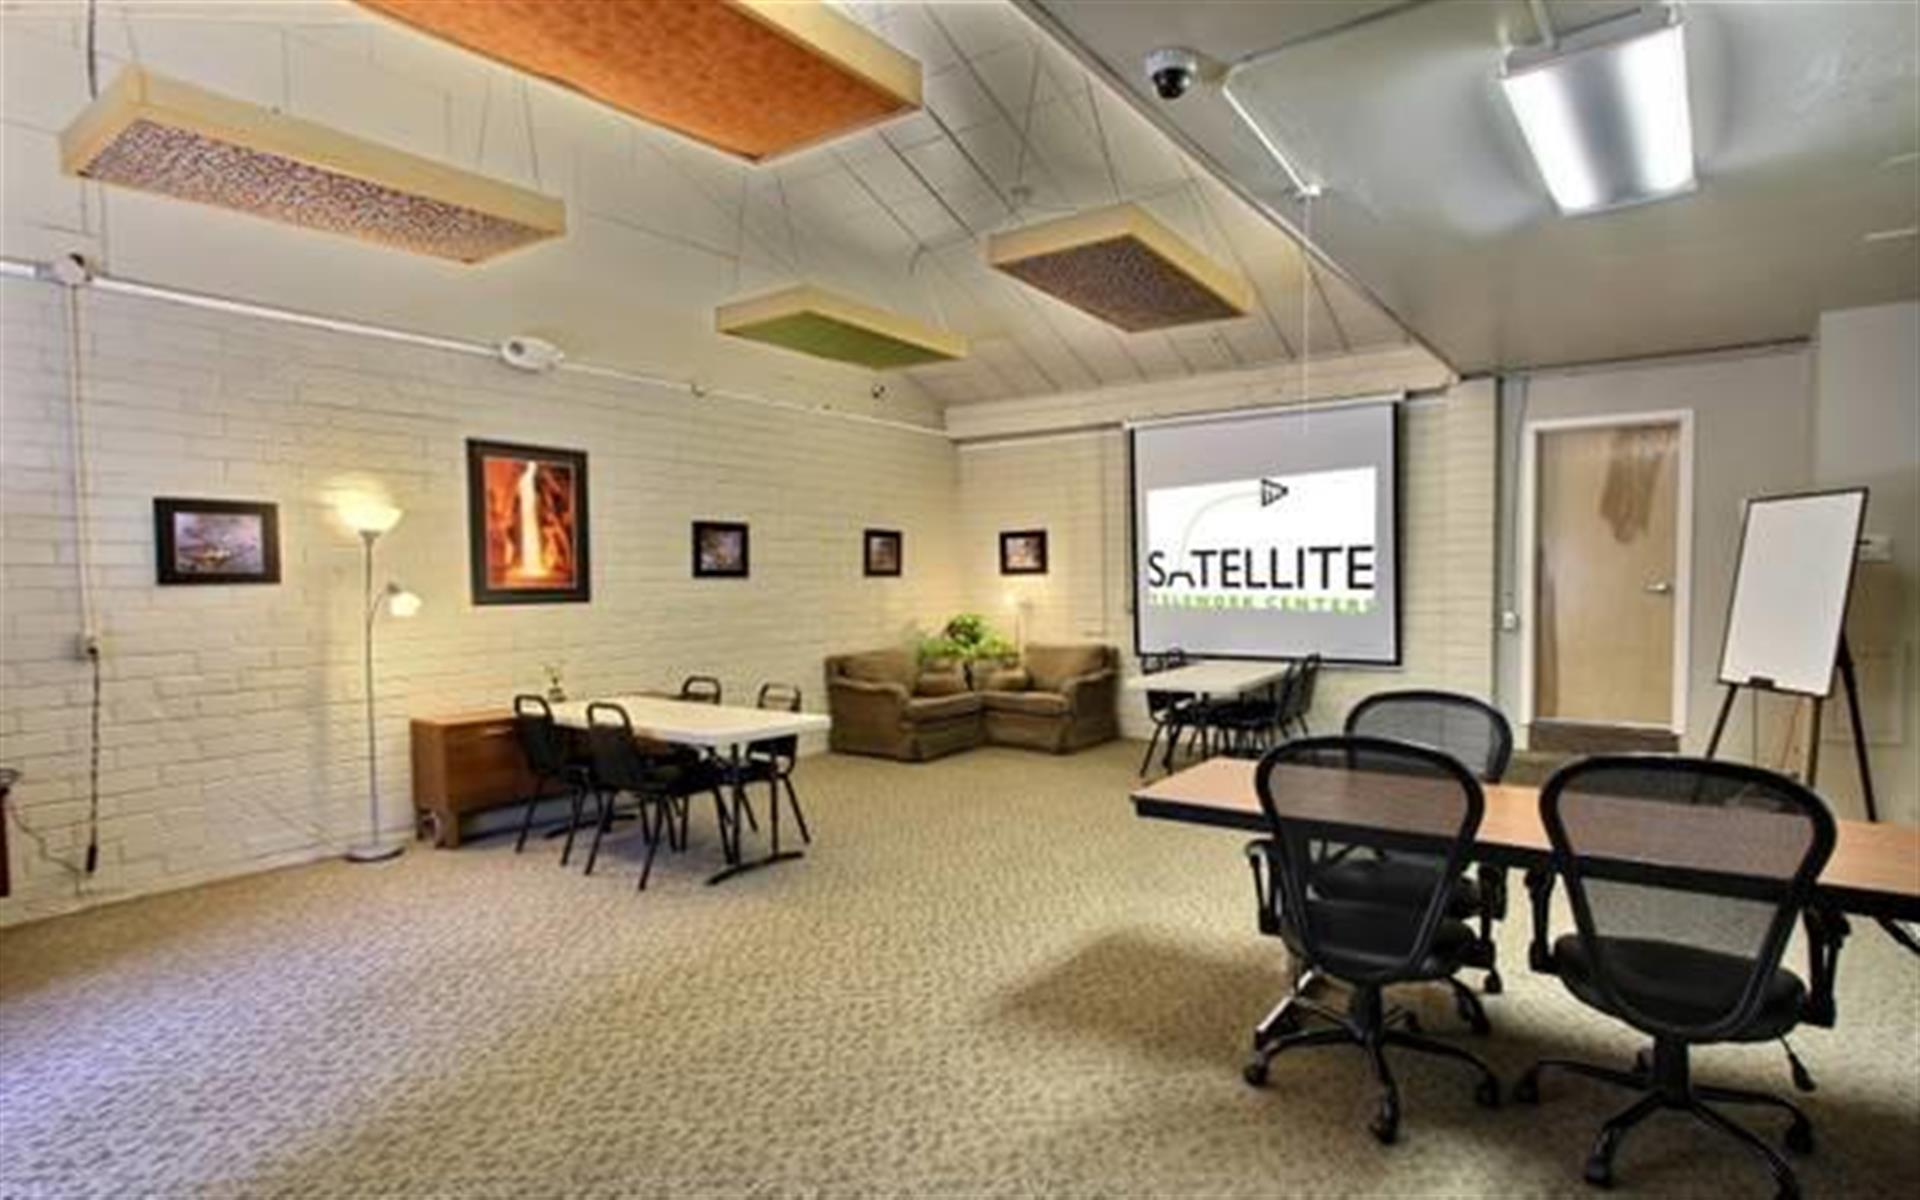 The Satellite Felton - Classroom/Event Room